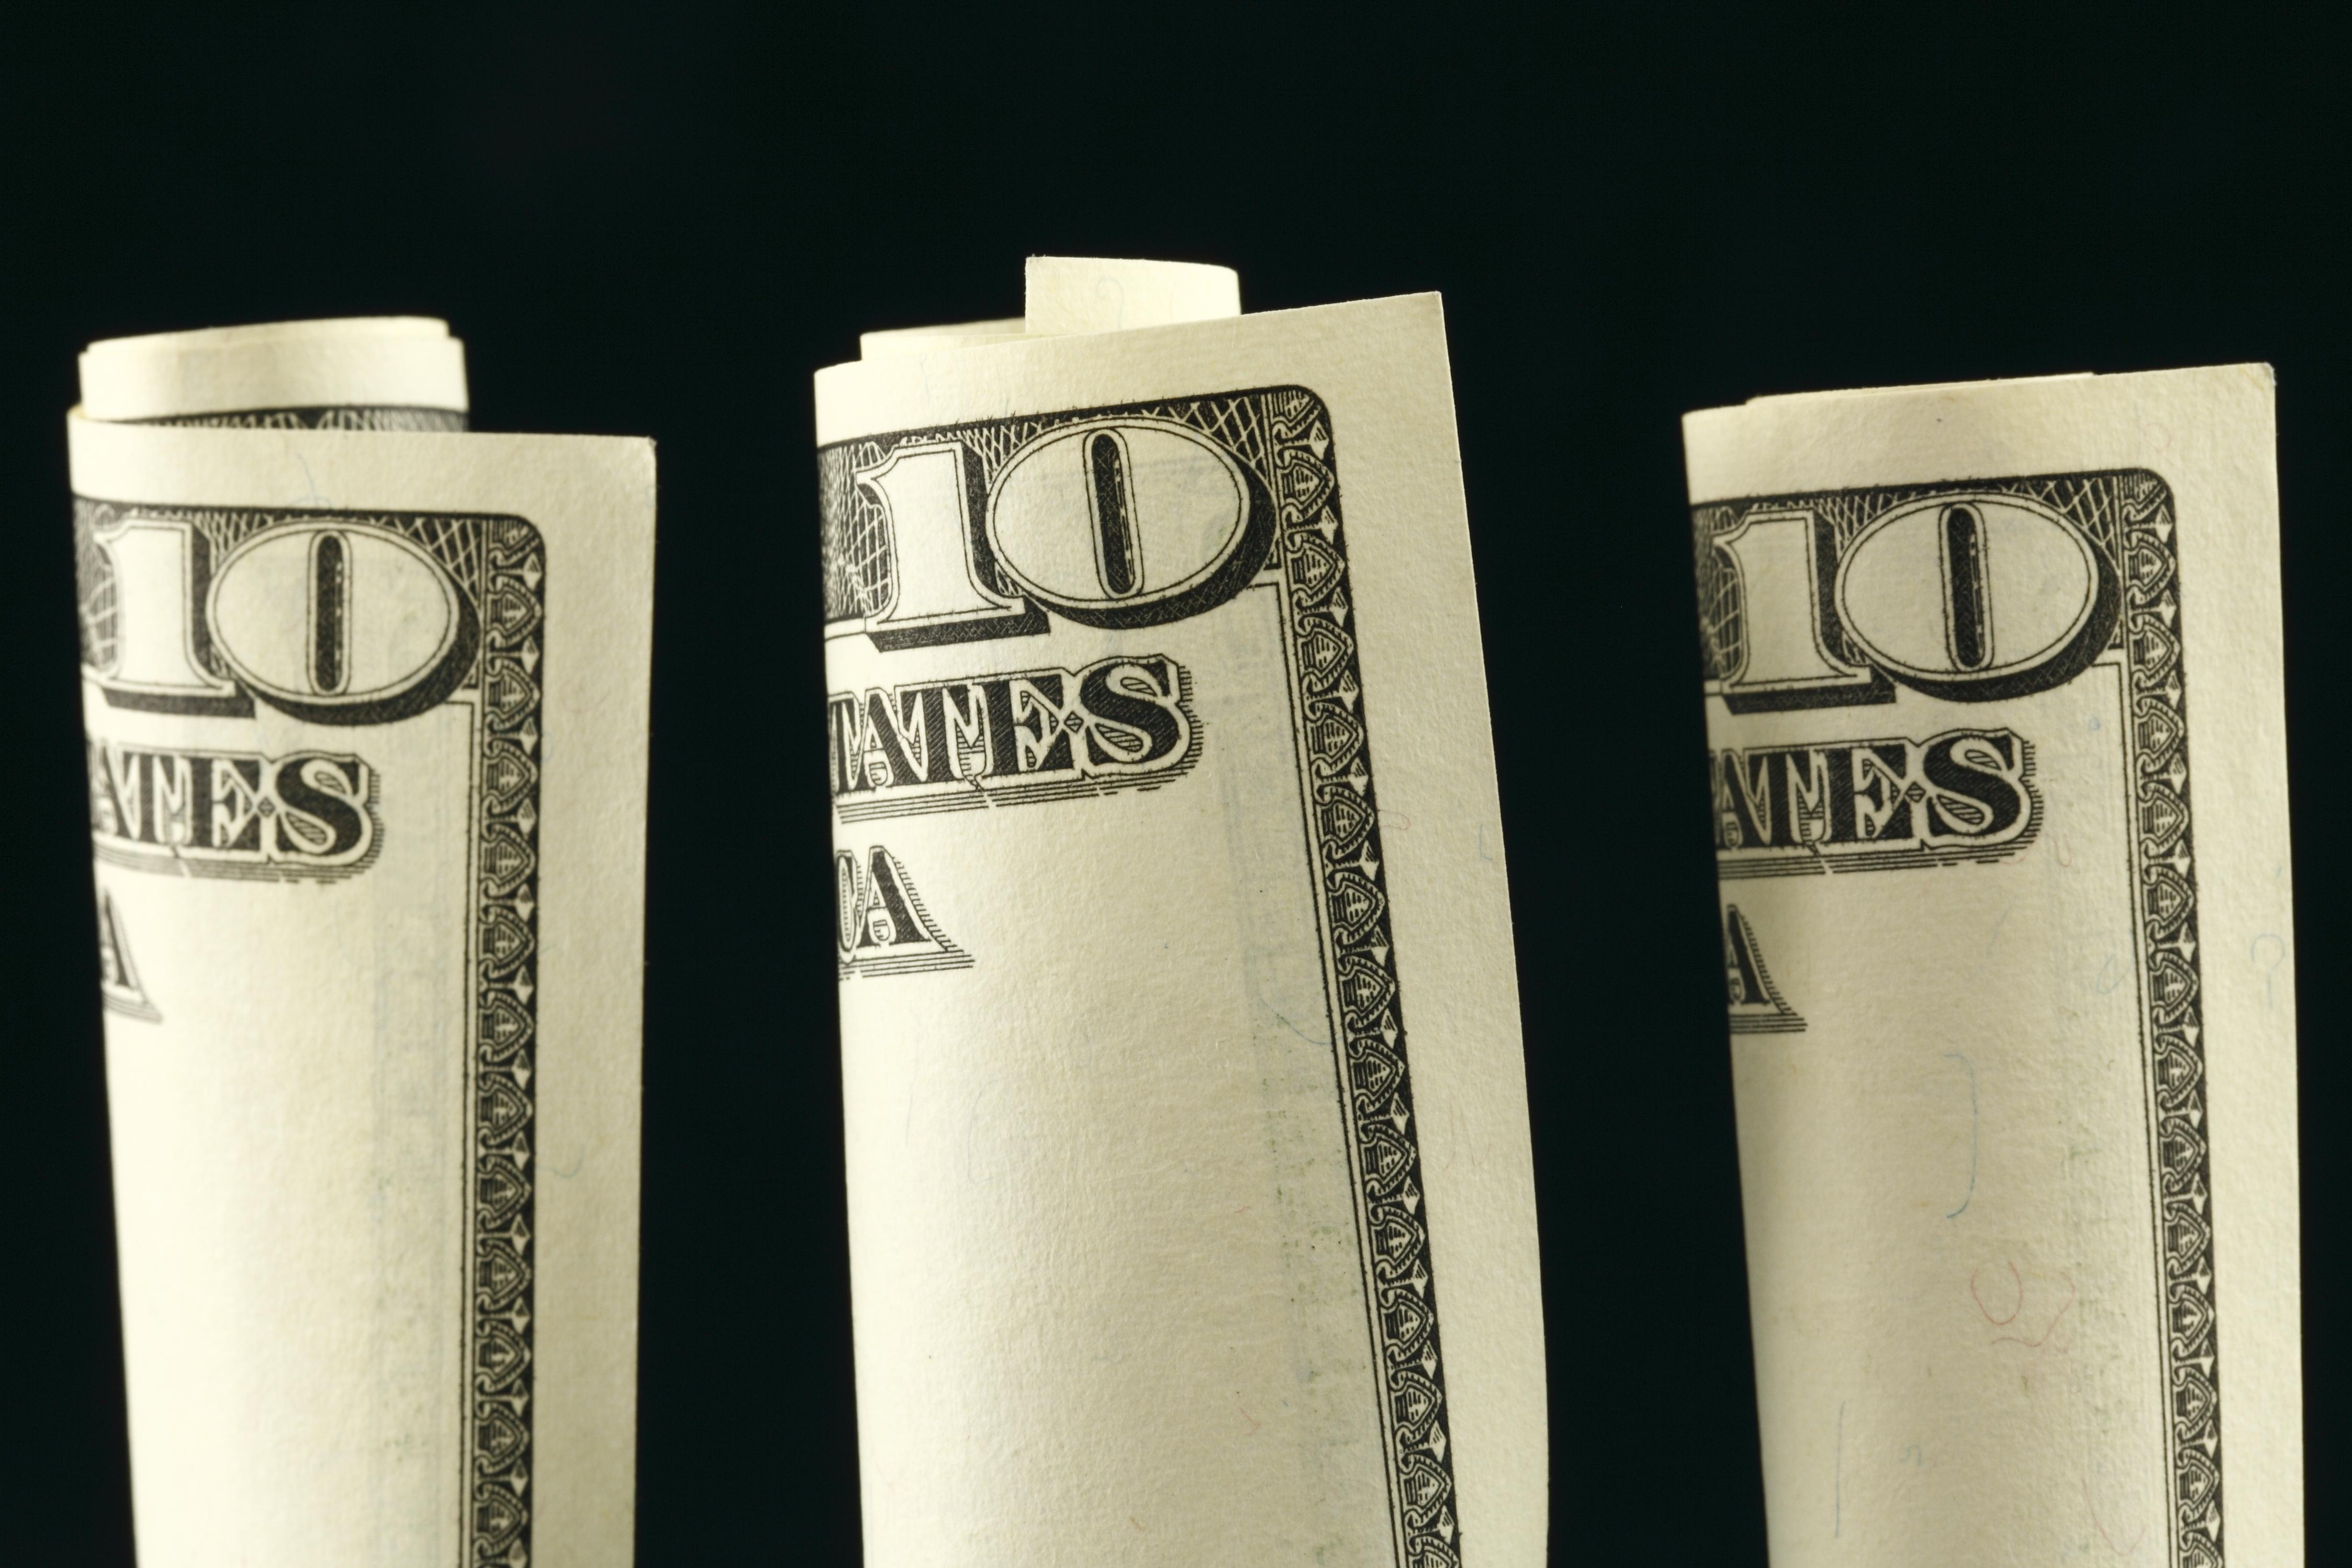 Three $10 bills rolled up